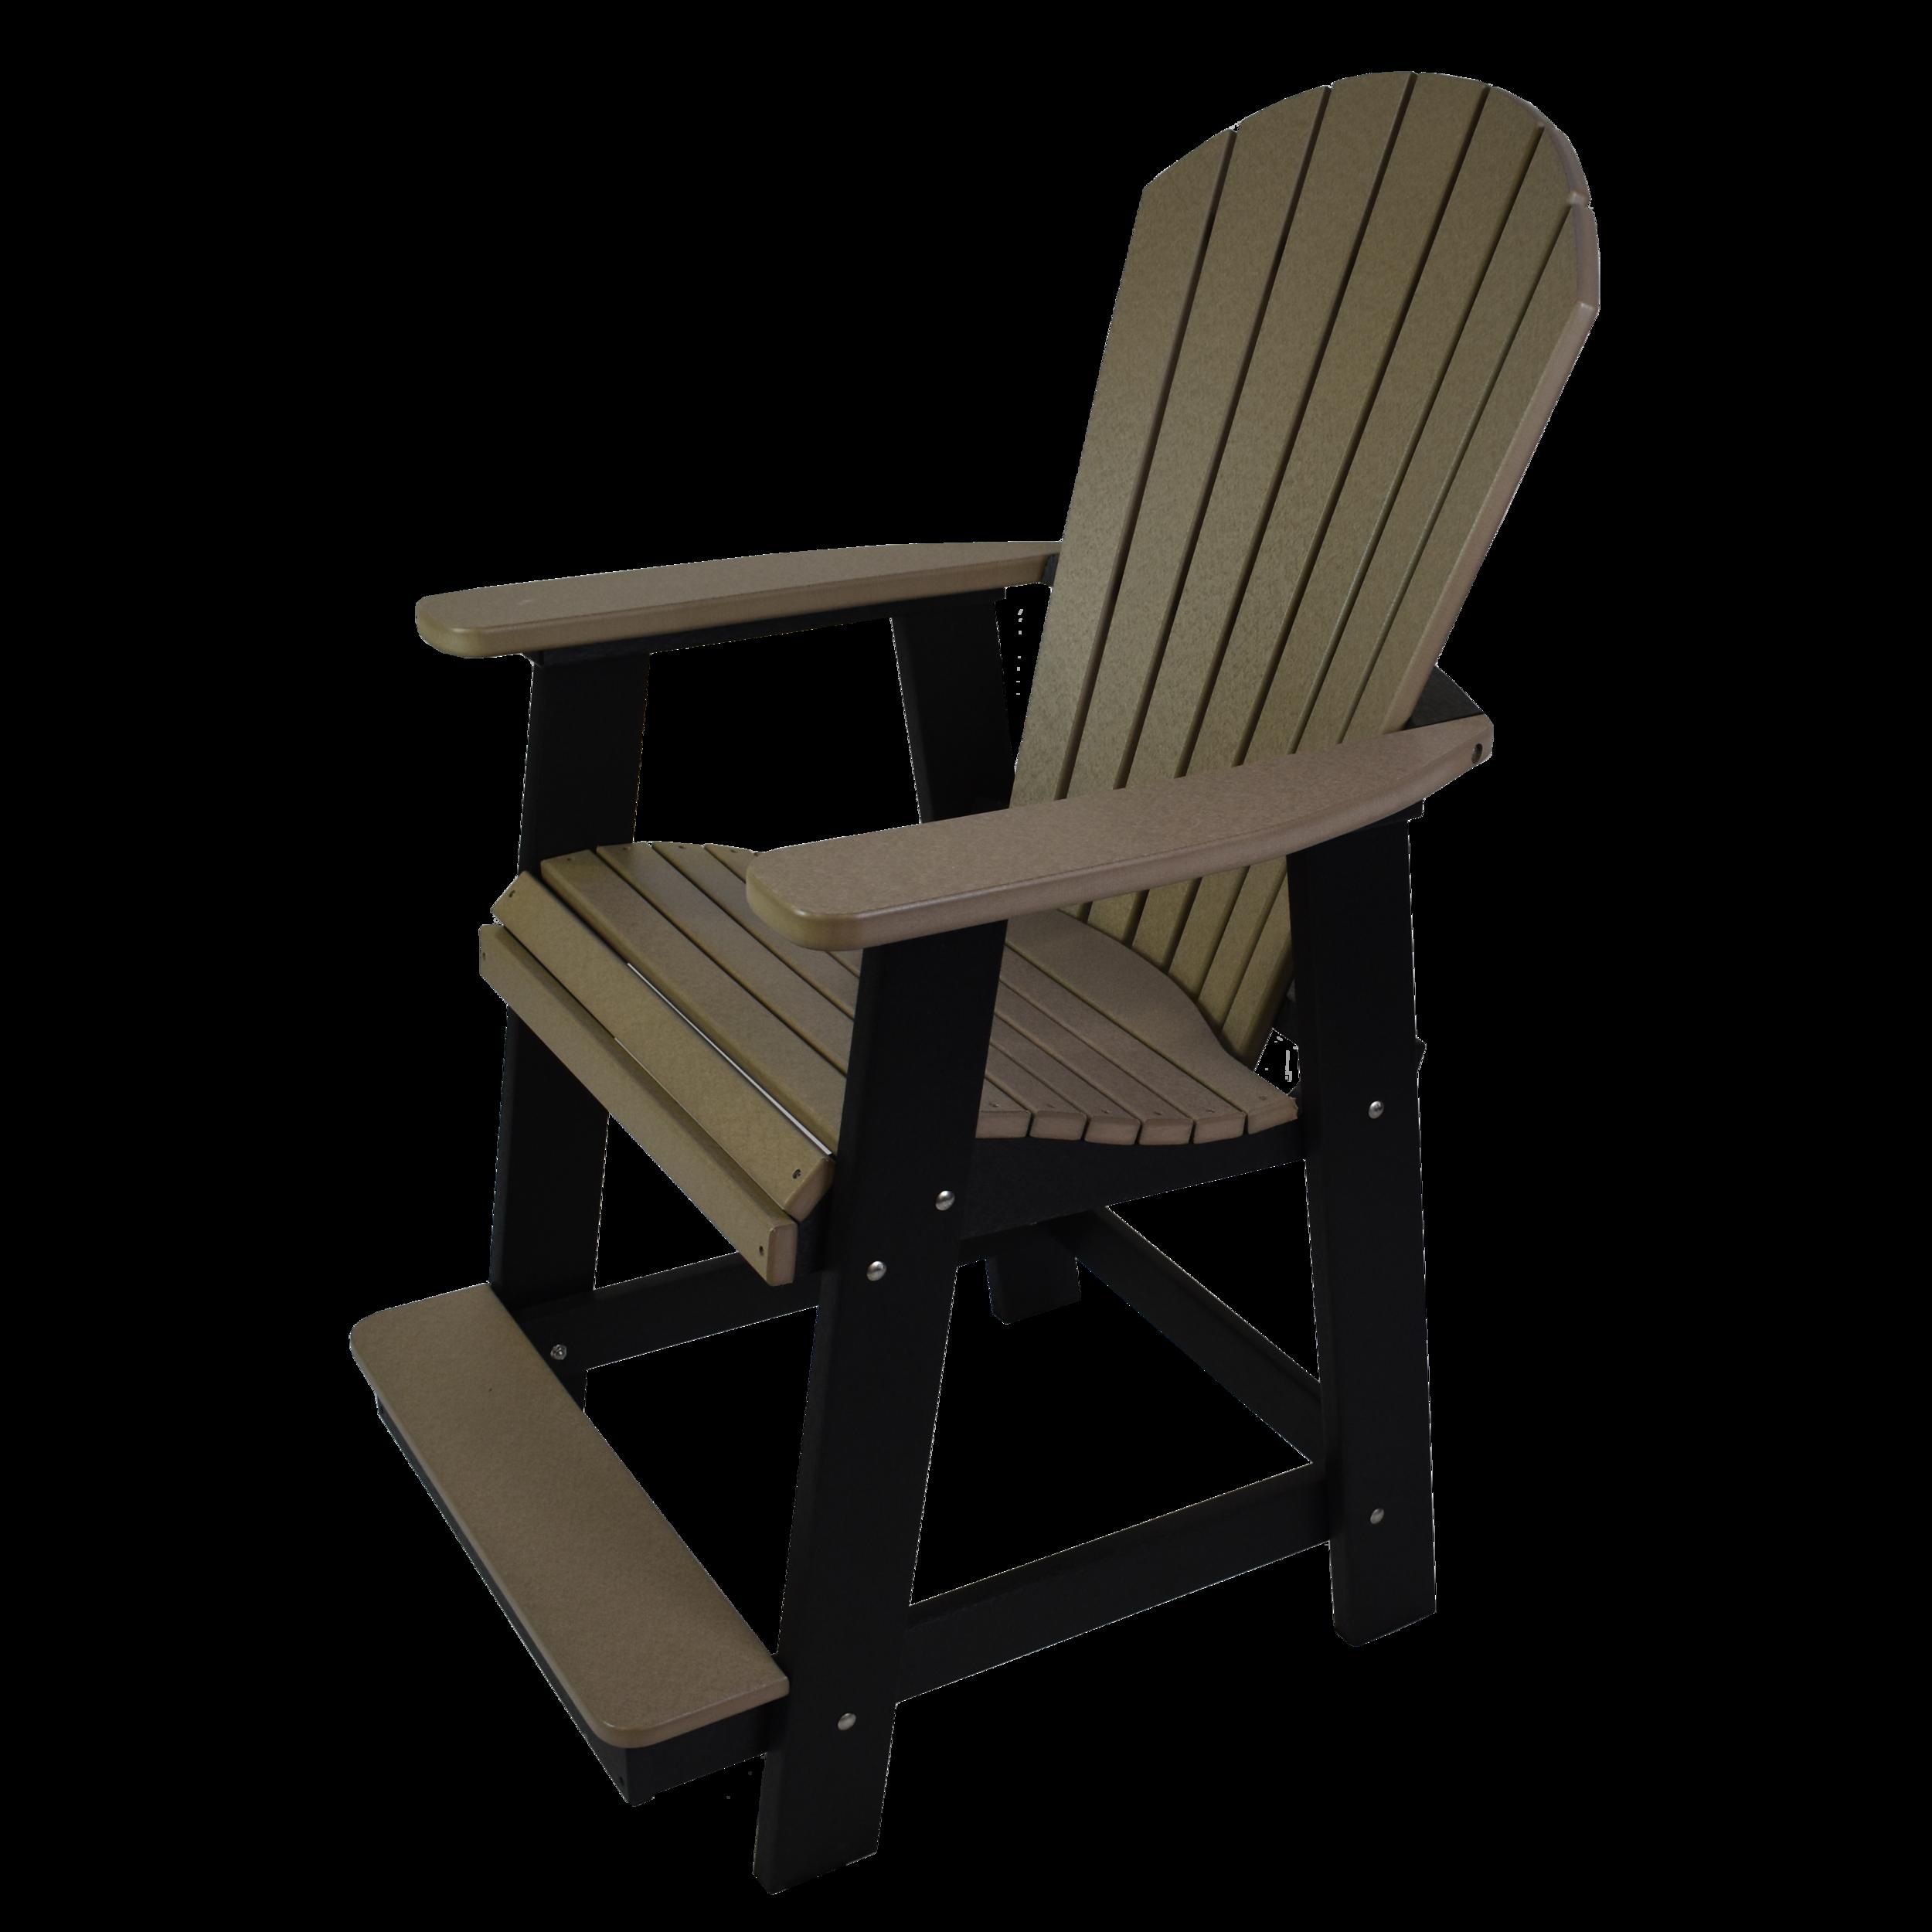 Cafe Adirondack Chair